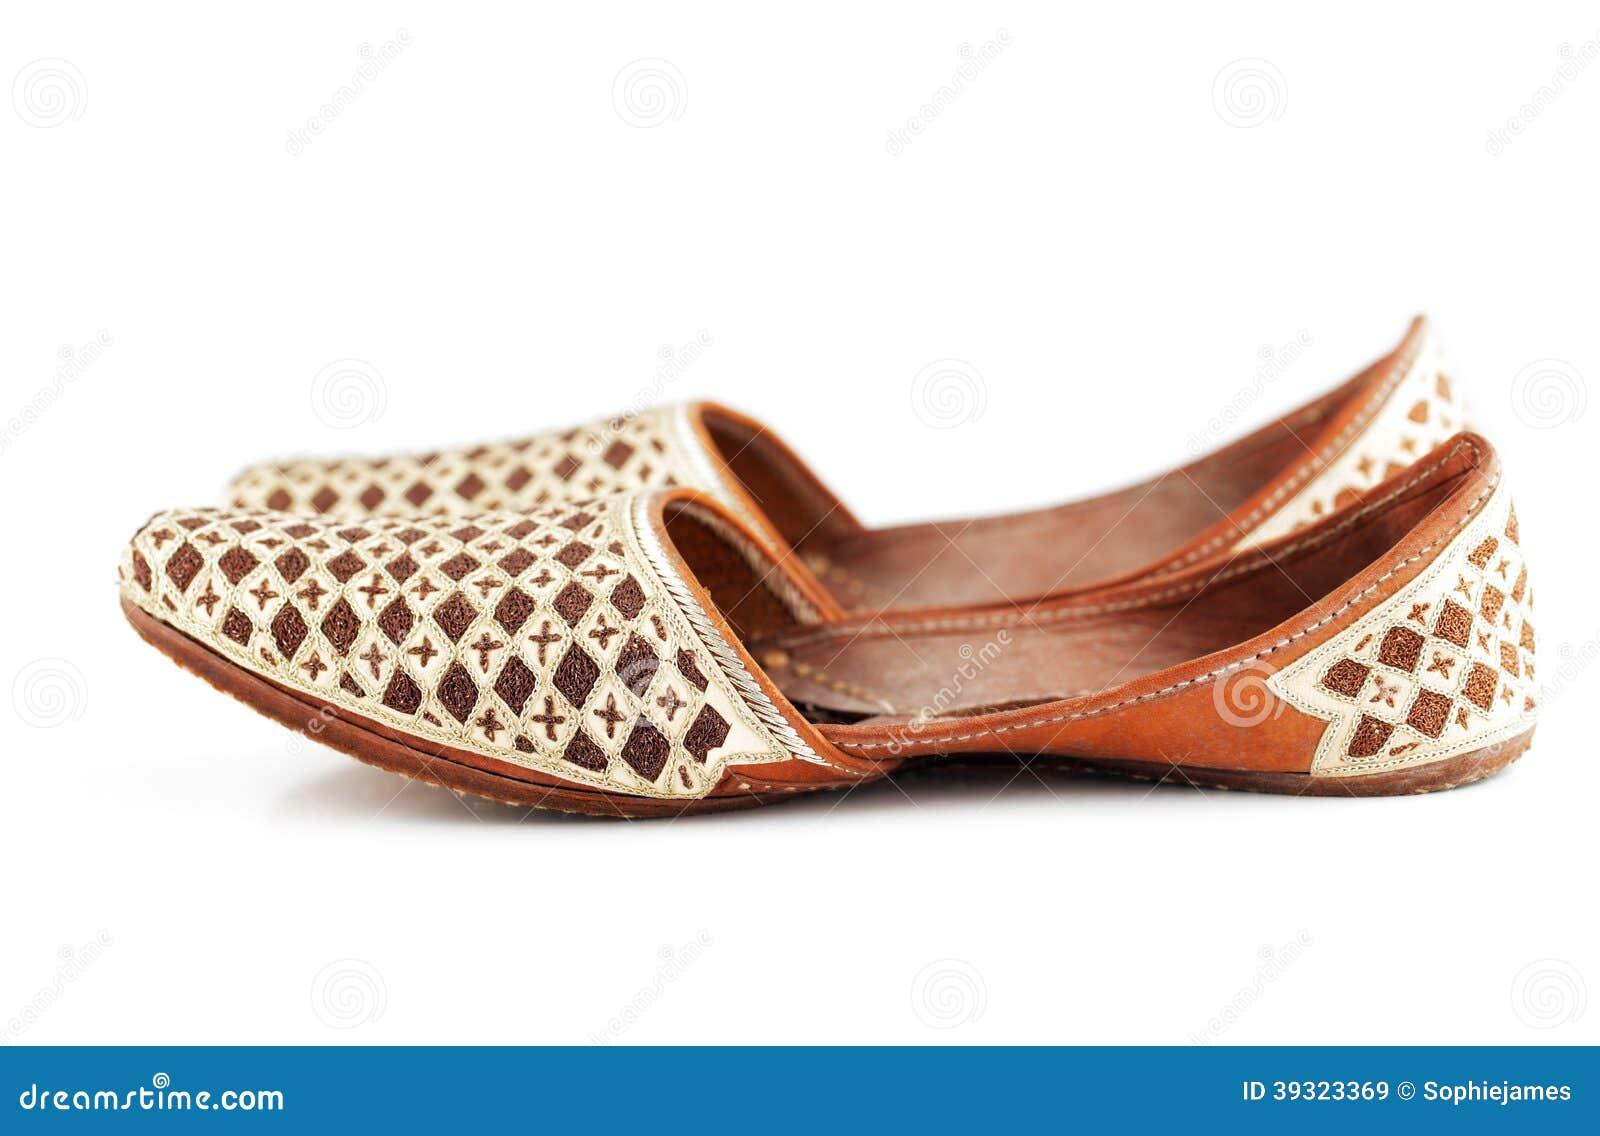 cbb159da0e7 Traditional Arabic slippers shot against a white background